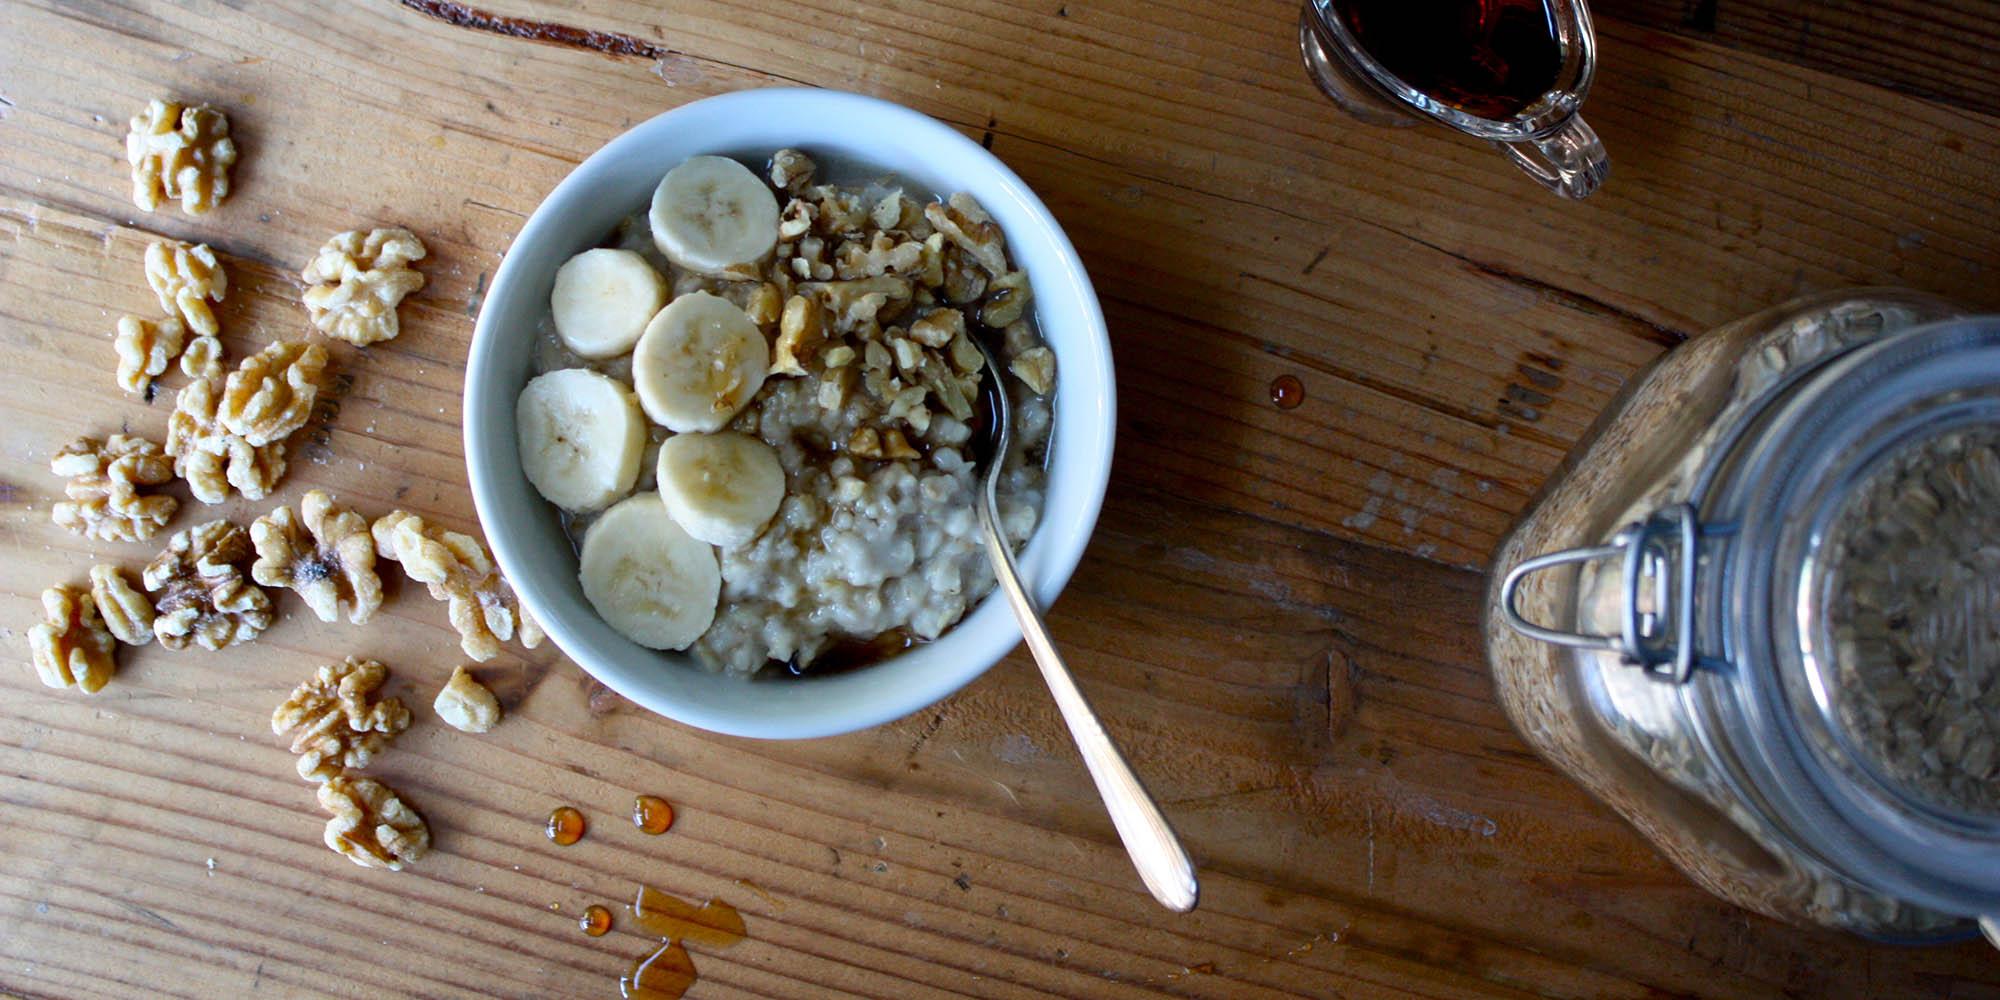 Oatmeal with Walnuts and Banana